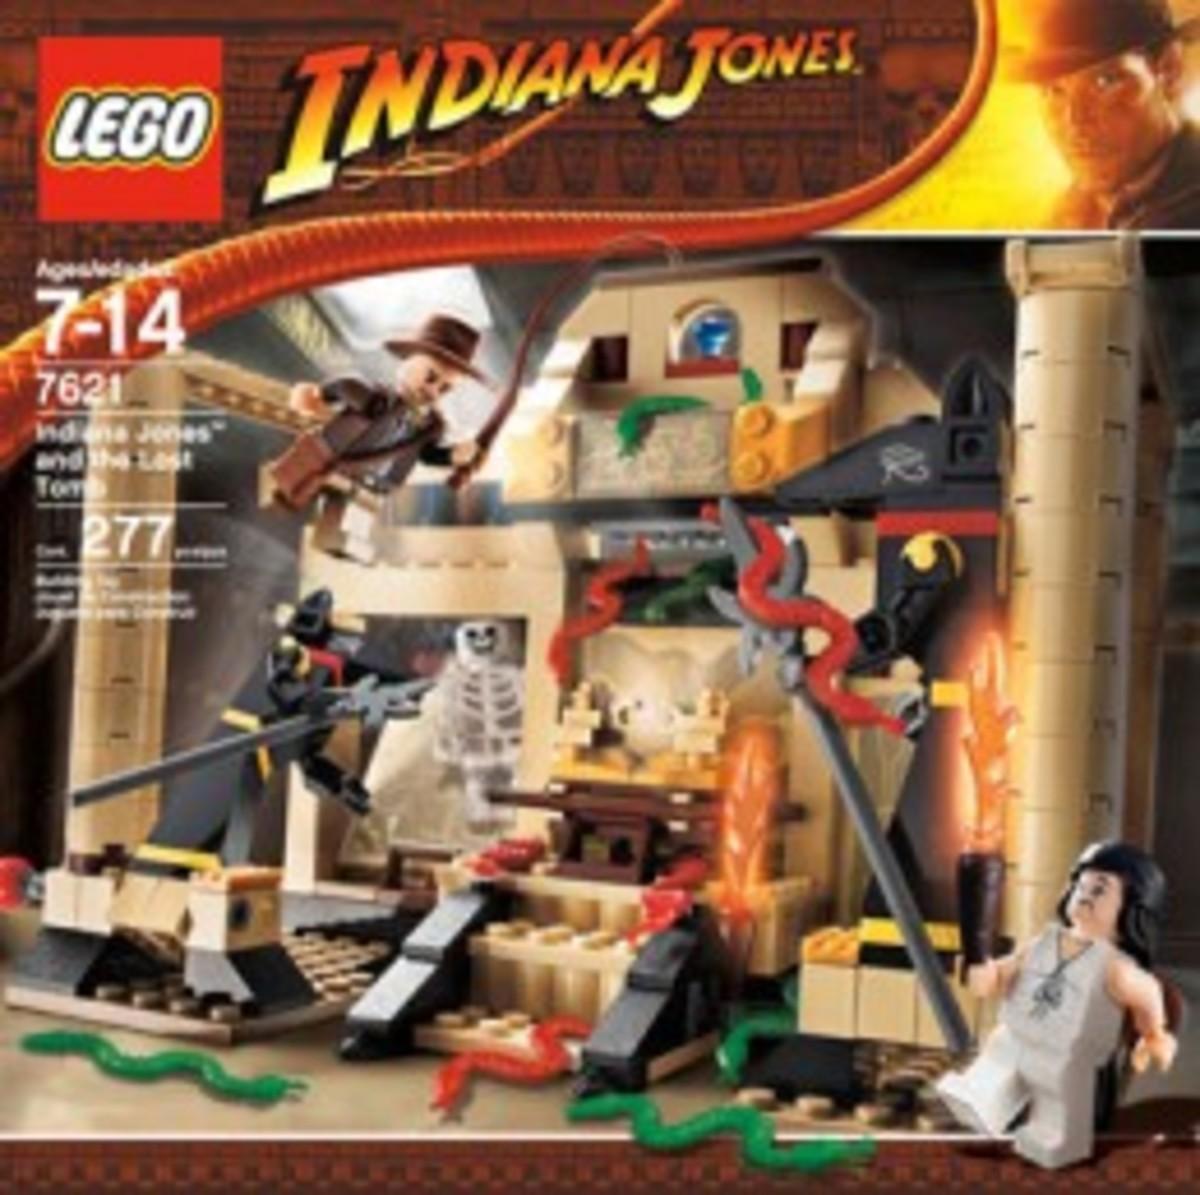 Lego Indiana Jones The Lost Tomb 7621 Box